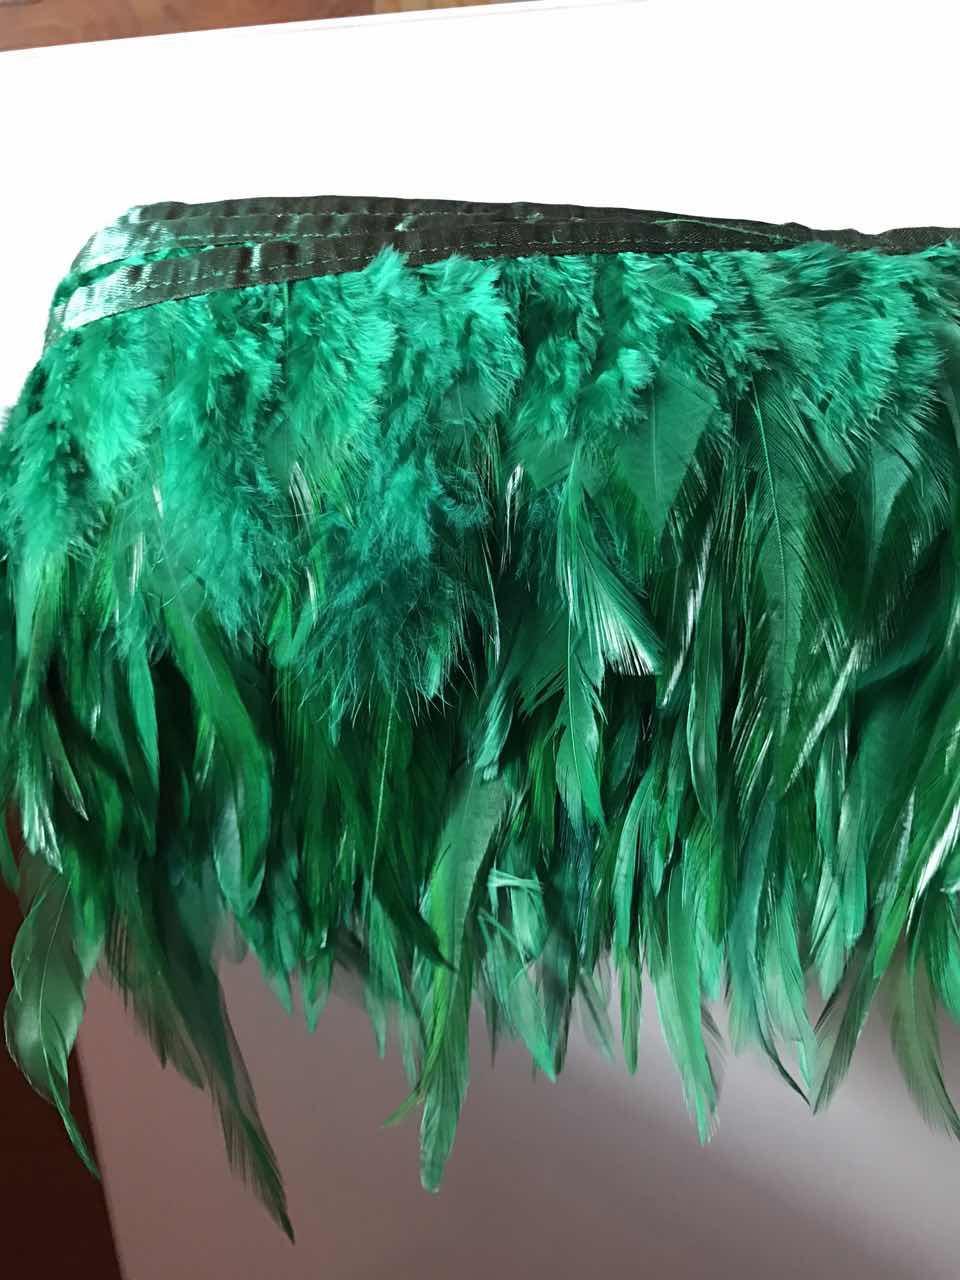 Перьевая тесьма из перьев петуха.Цвет на зеленый.Цена за 0,5м